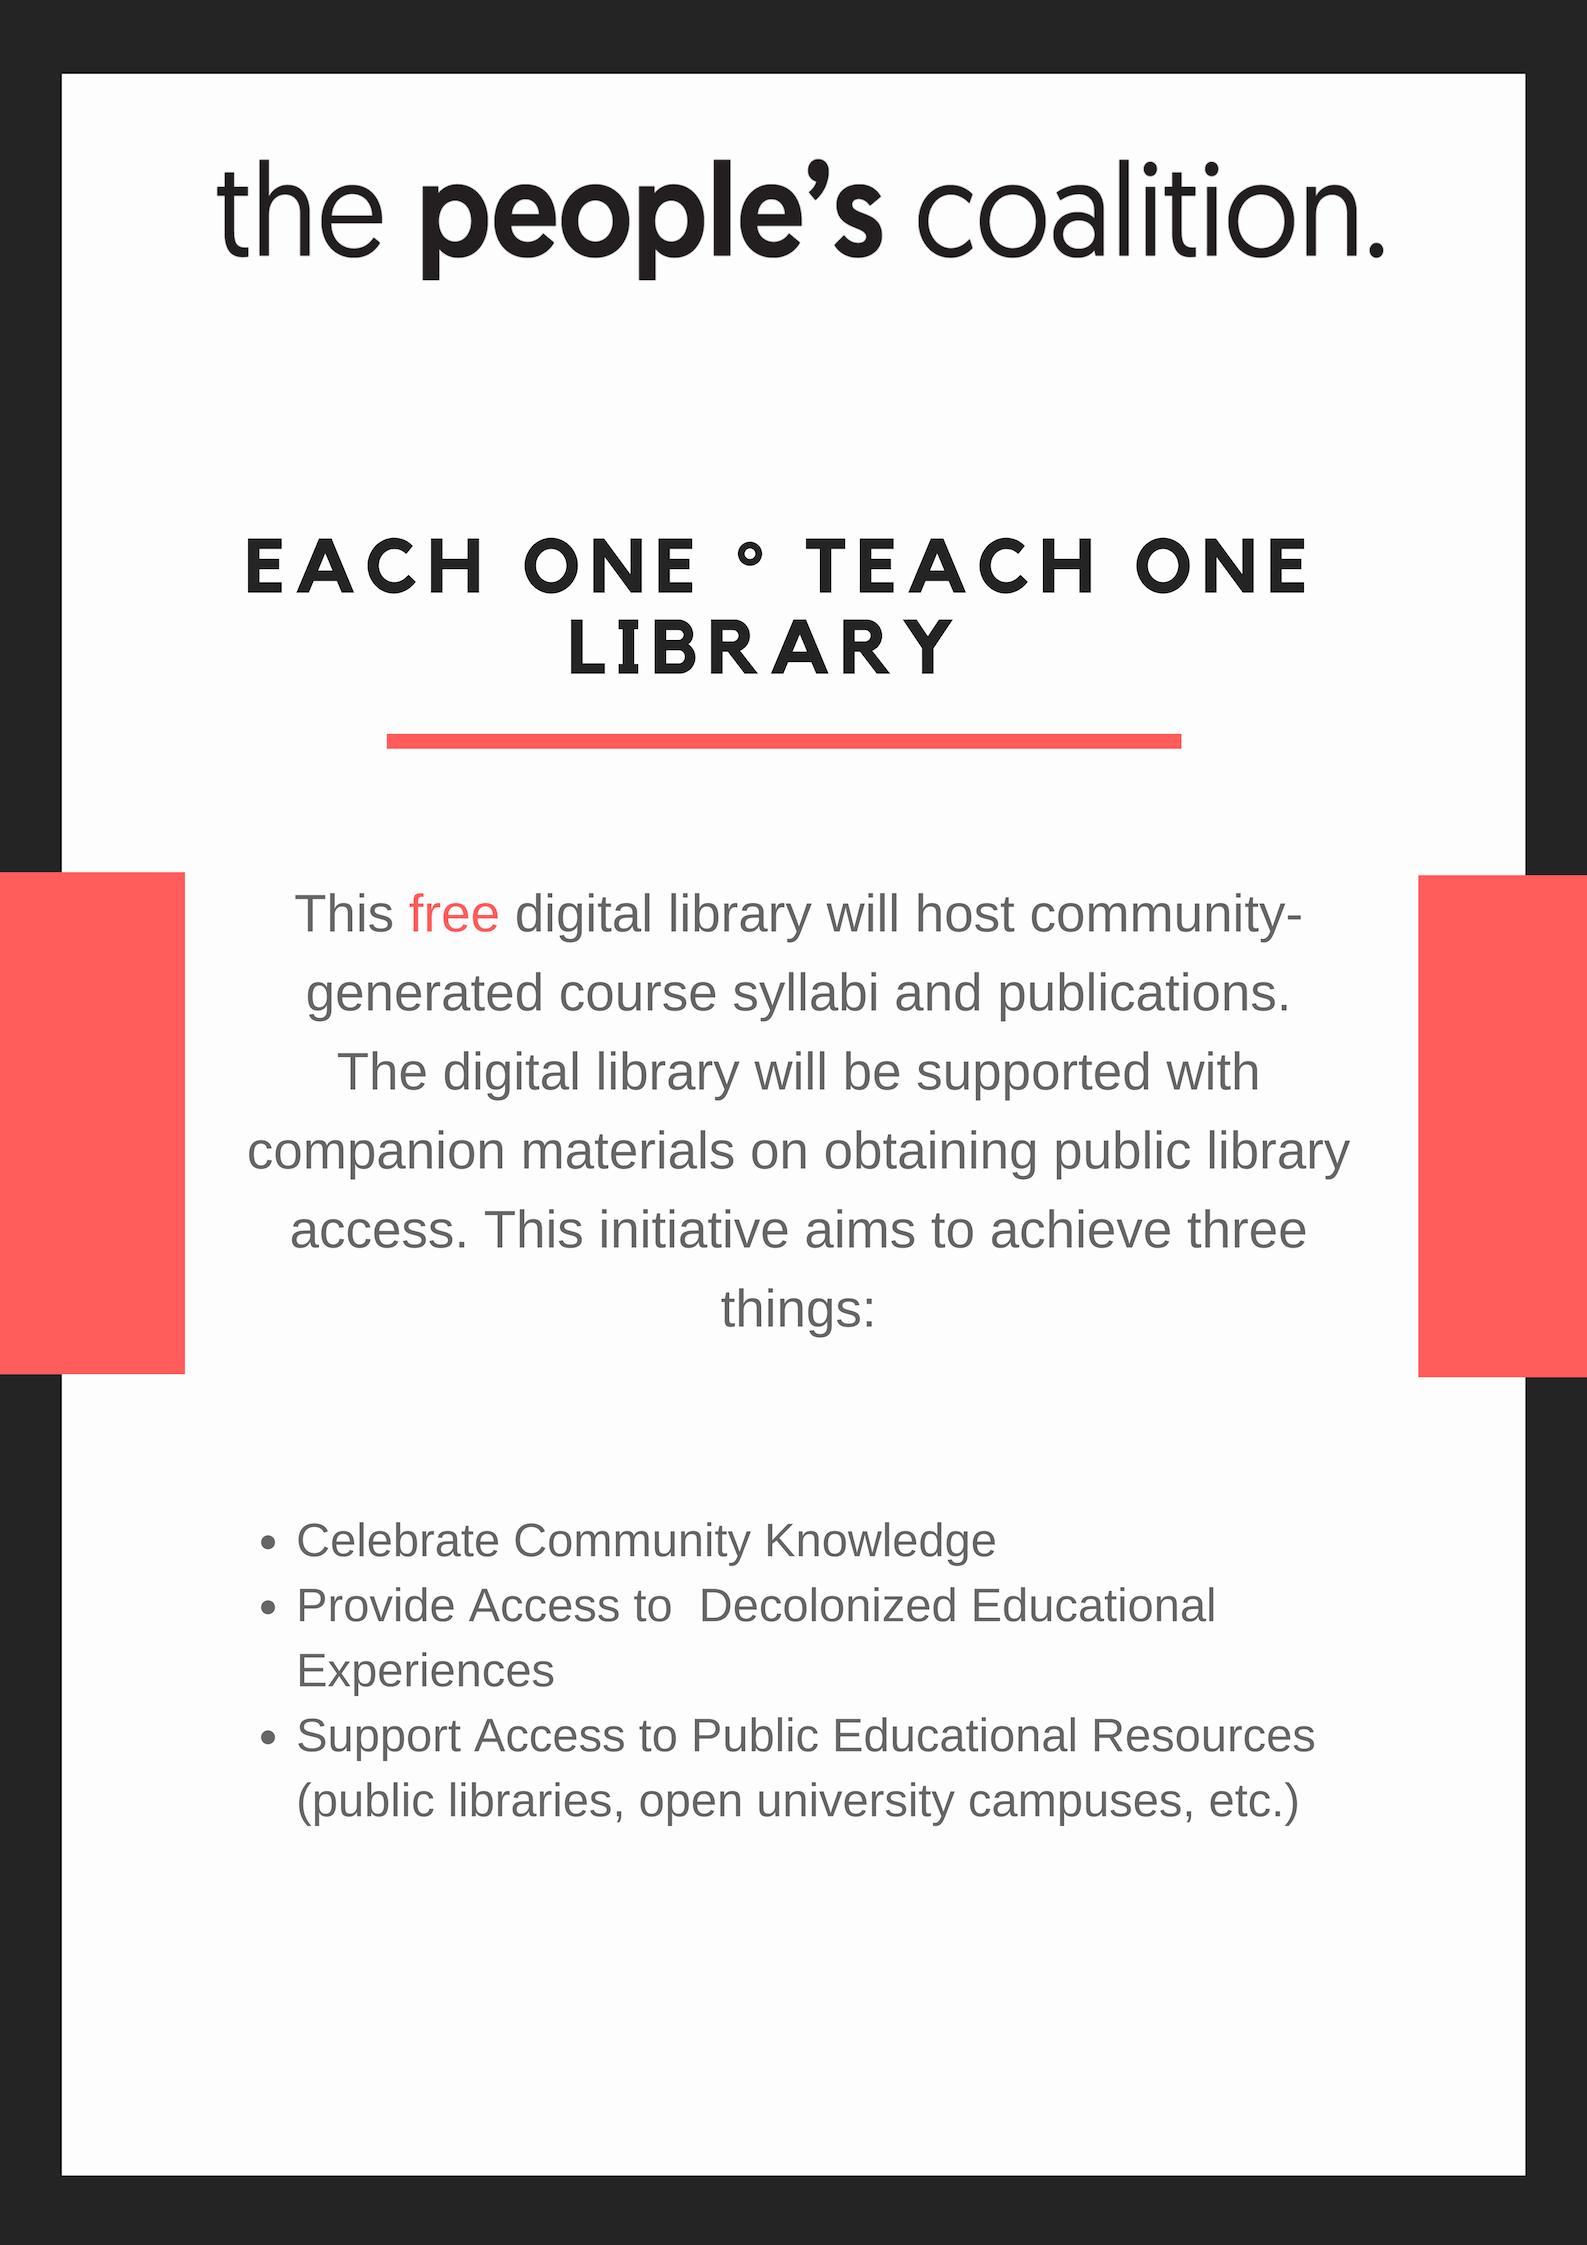 Each One ° Teach One Library.jpg